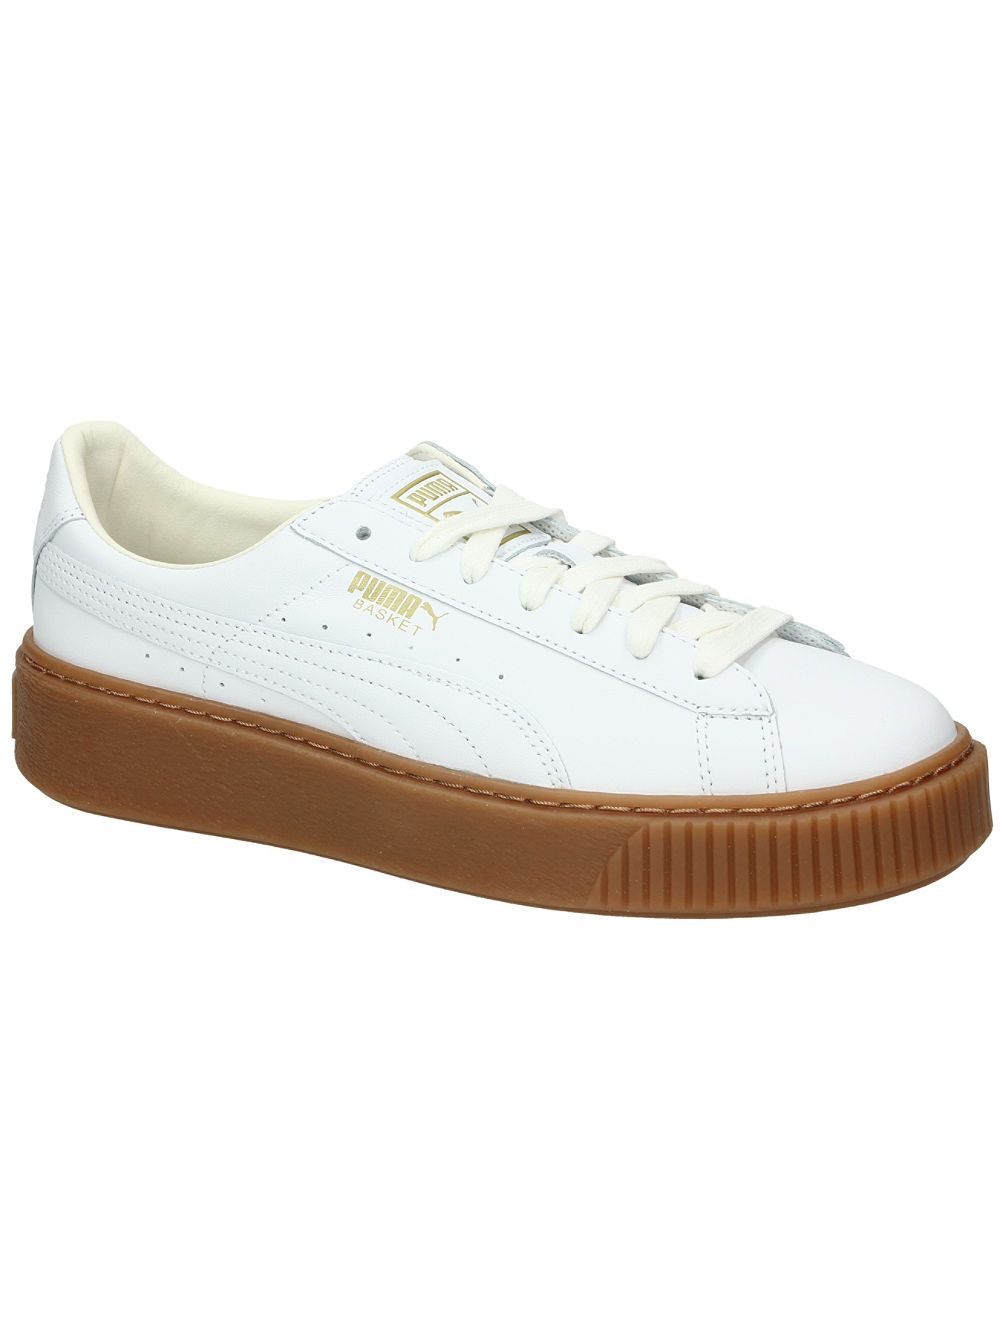 Buy Puma Basket Platform Core Sneakers Women online at blue-tomato.com 8105f3dbe